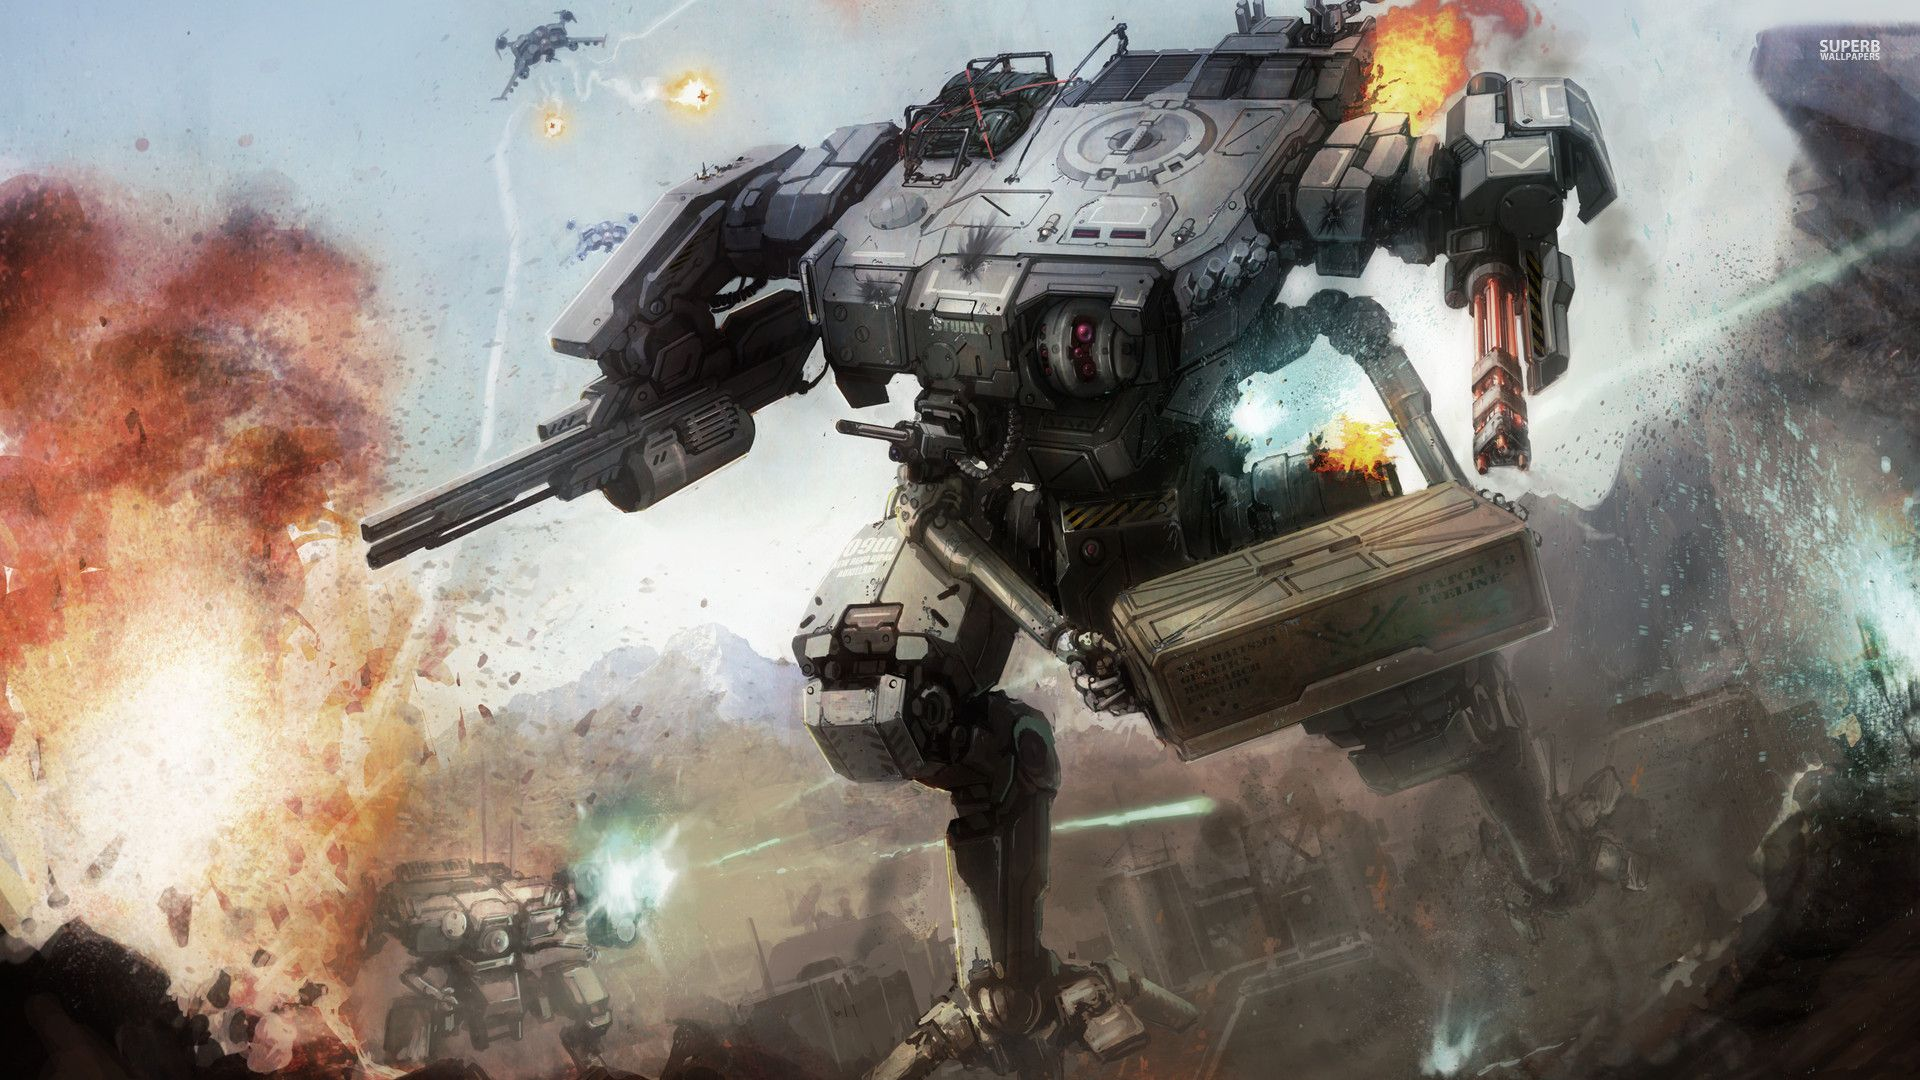 Mechwarrior Battletech Wallpaper Science Fiction Illustration Concept Art Battle Robots